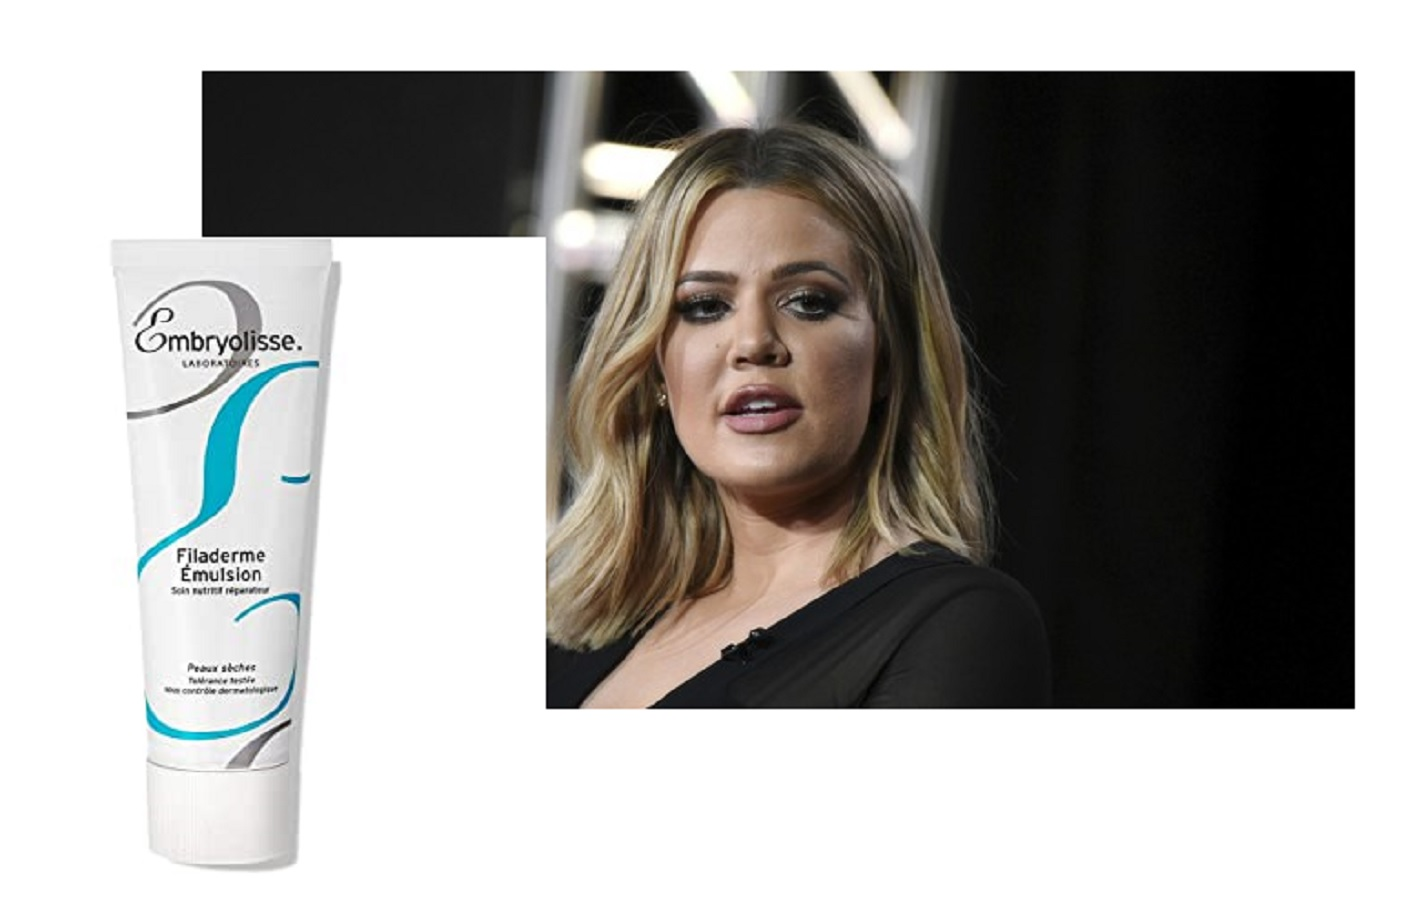 Khloé Kardashian usa questa crema idratante da 20 euro